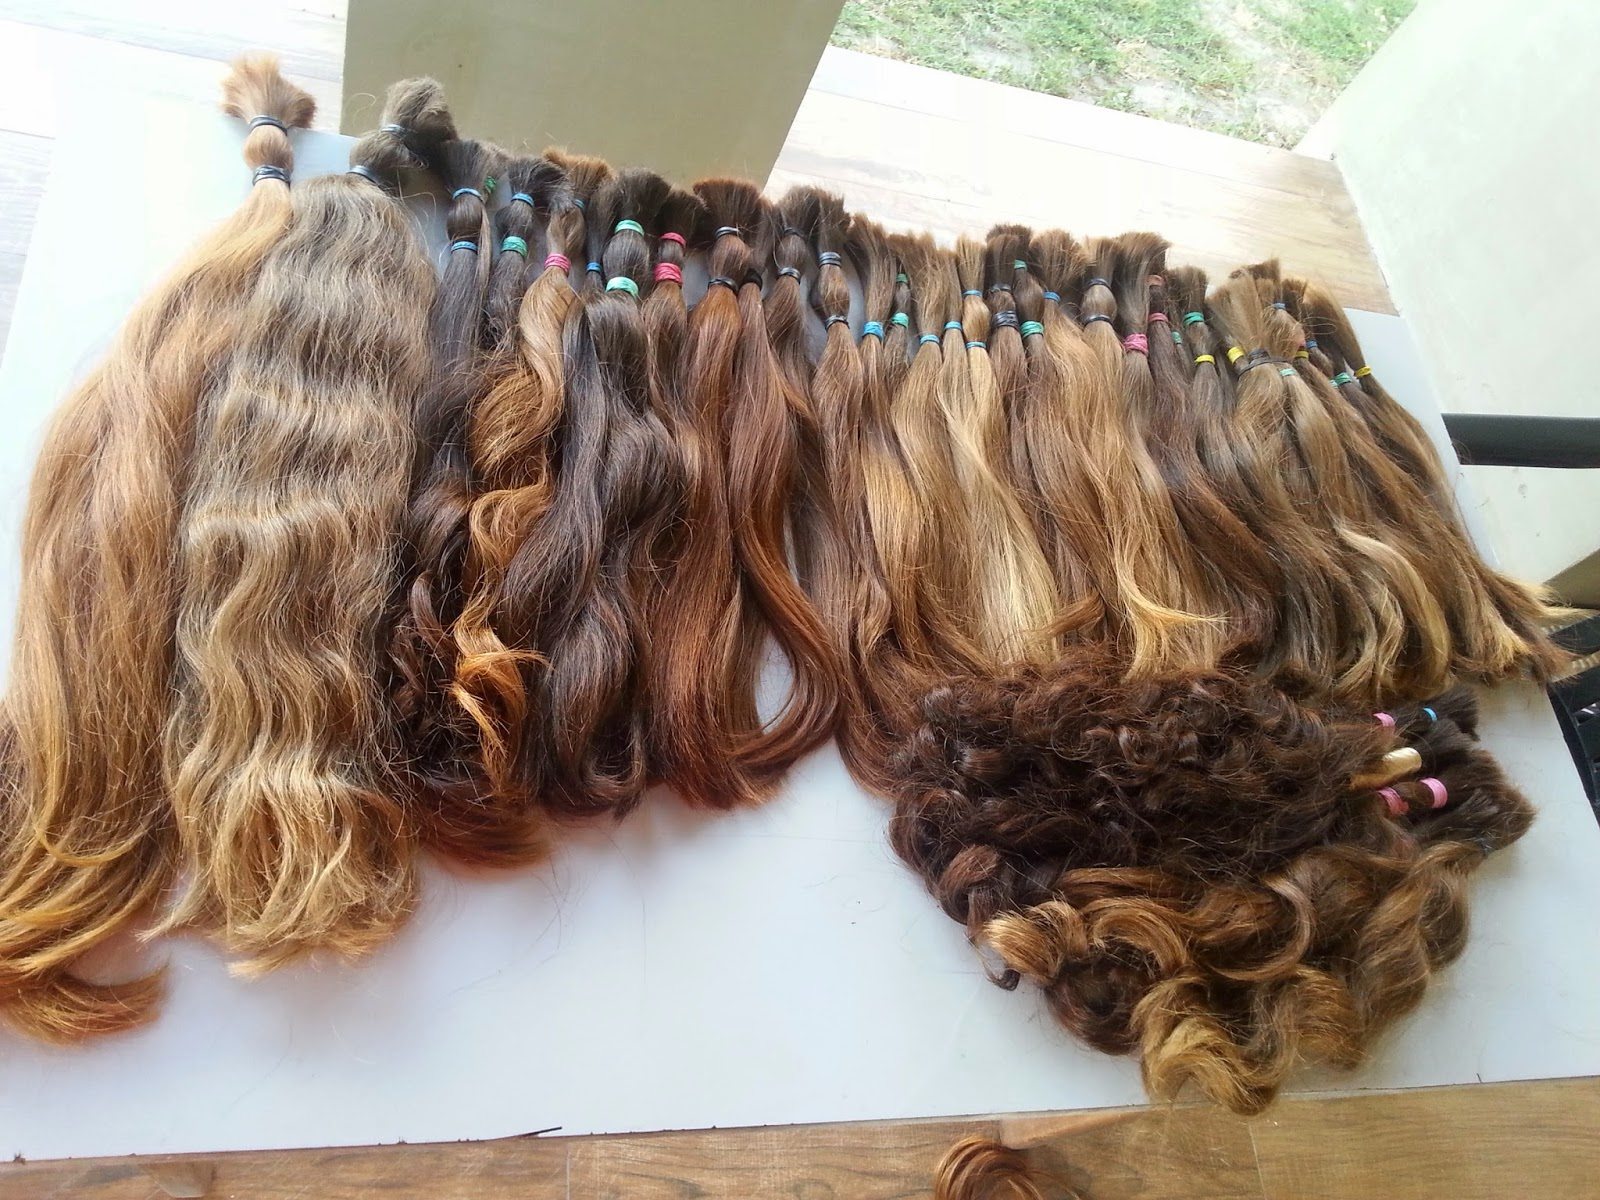 Predlžovanie vlasov  Predlžovanie vlasov 21a0943055a